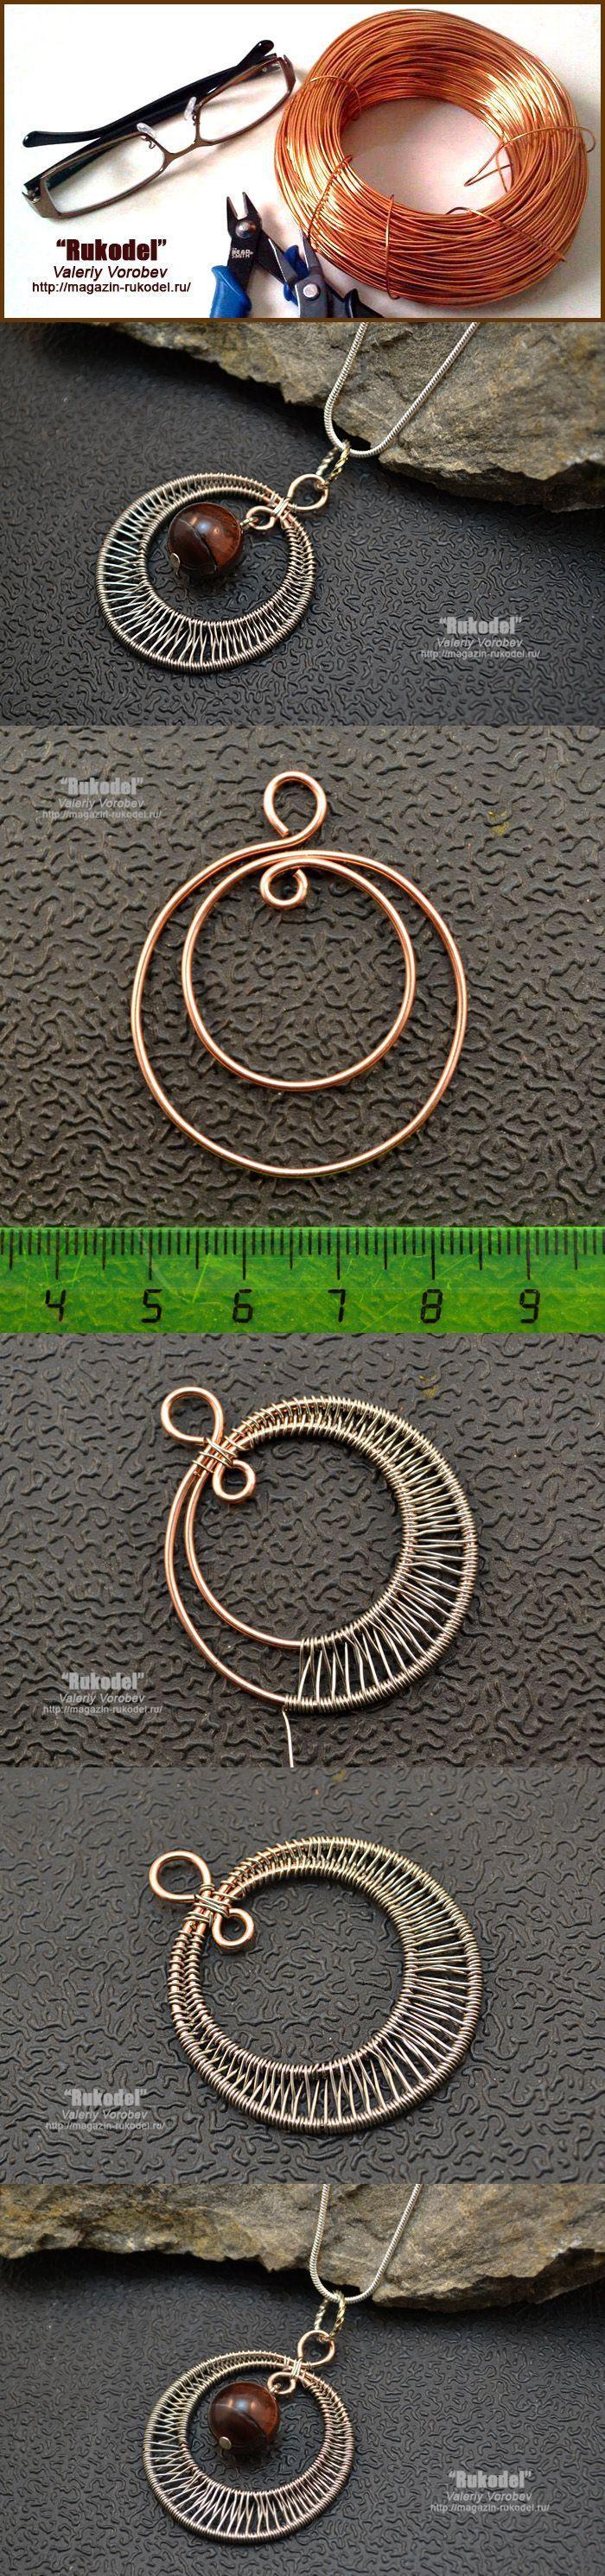 Tutorial DIY Wire Jewelry Image Description Wire Wrap Pendant